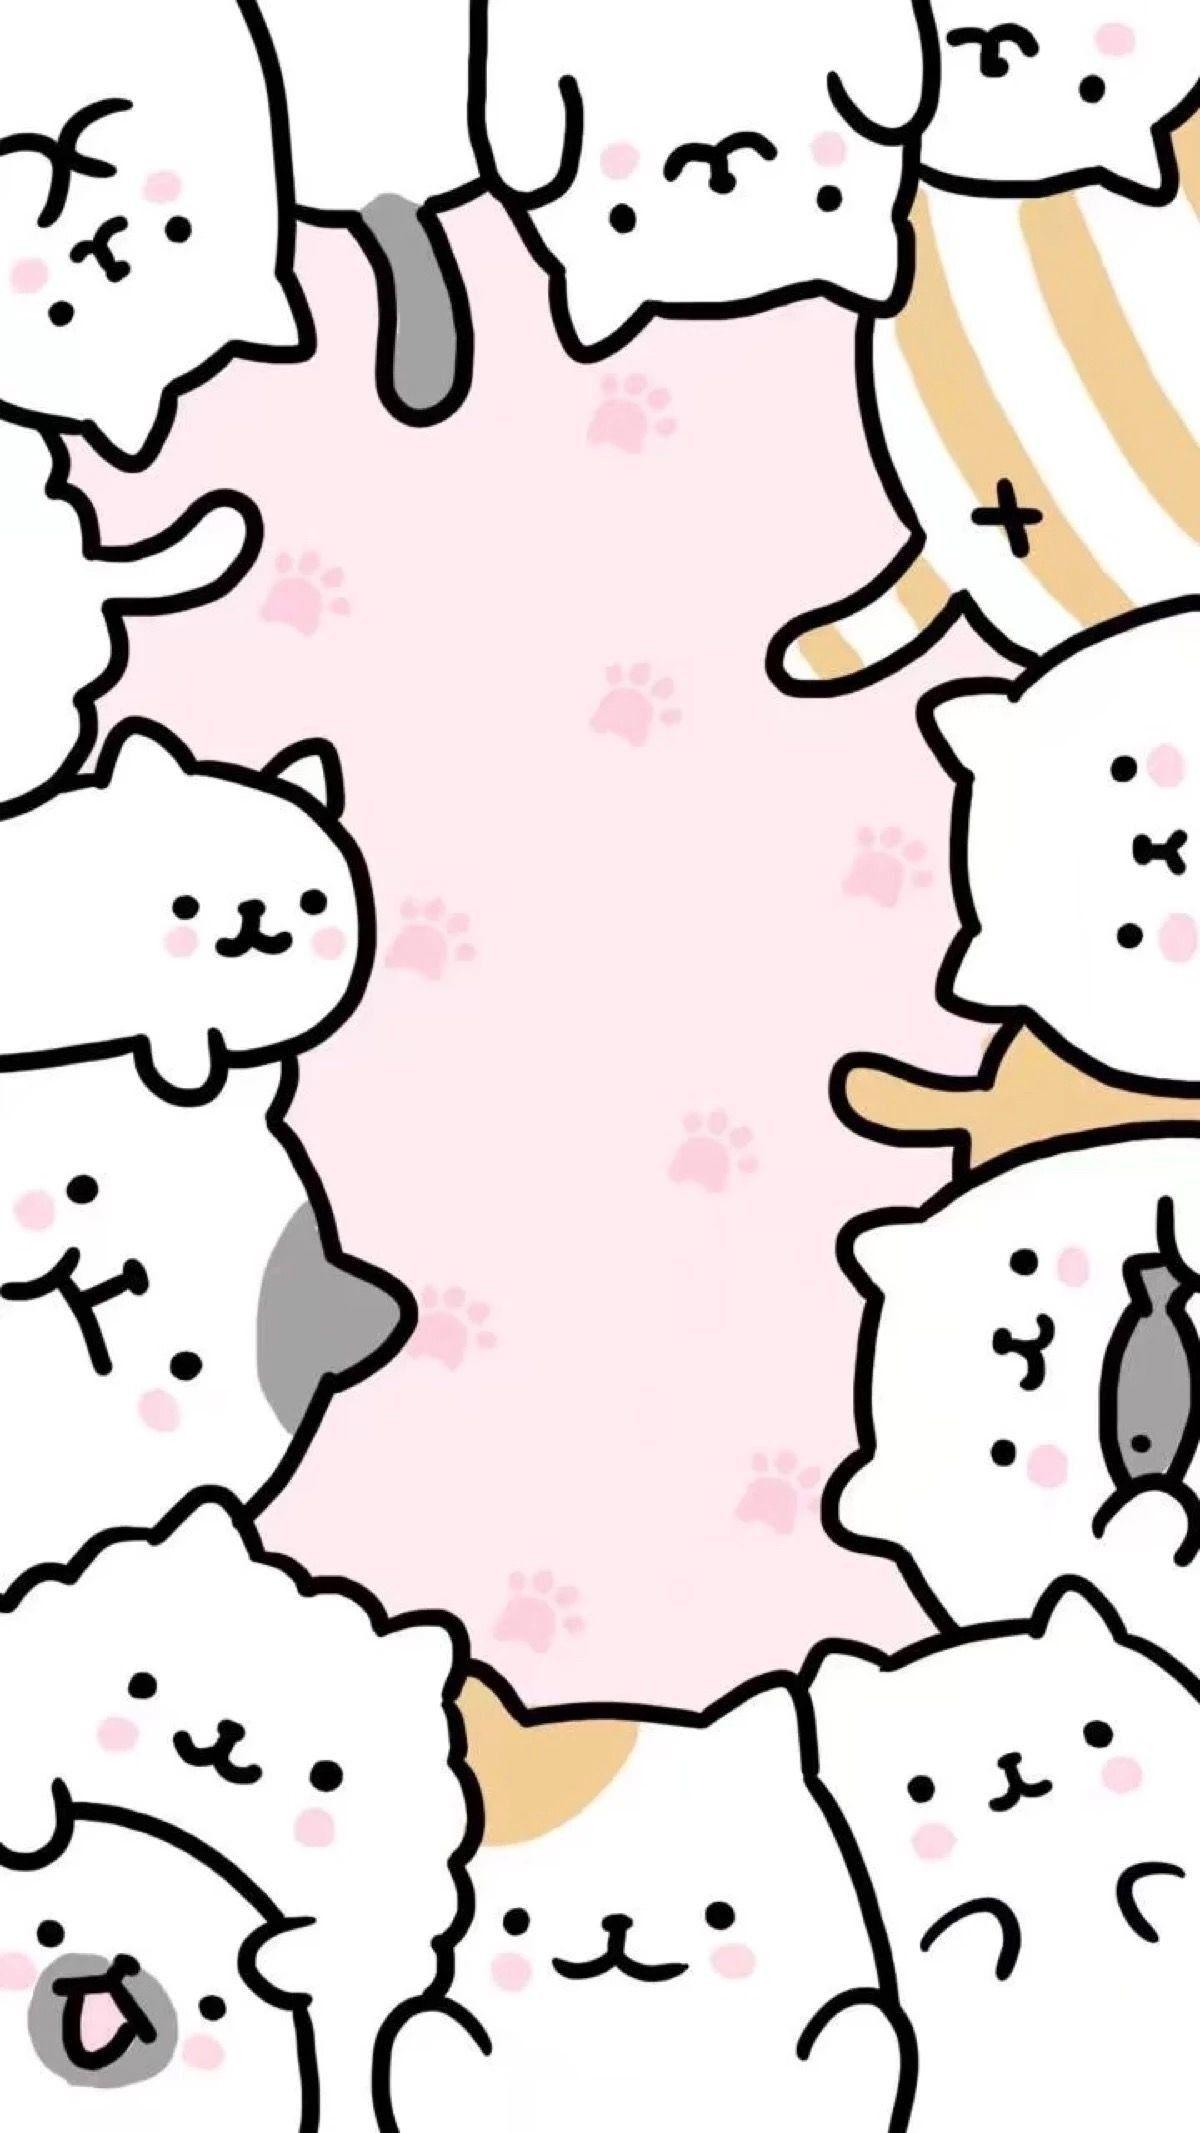 61 Papeis De Parede De Gato Kawaii No Wallpaperplay Catideas Cute Cat Wallpaper Cute Wallpapers Cat Wallpaper